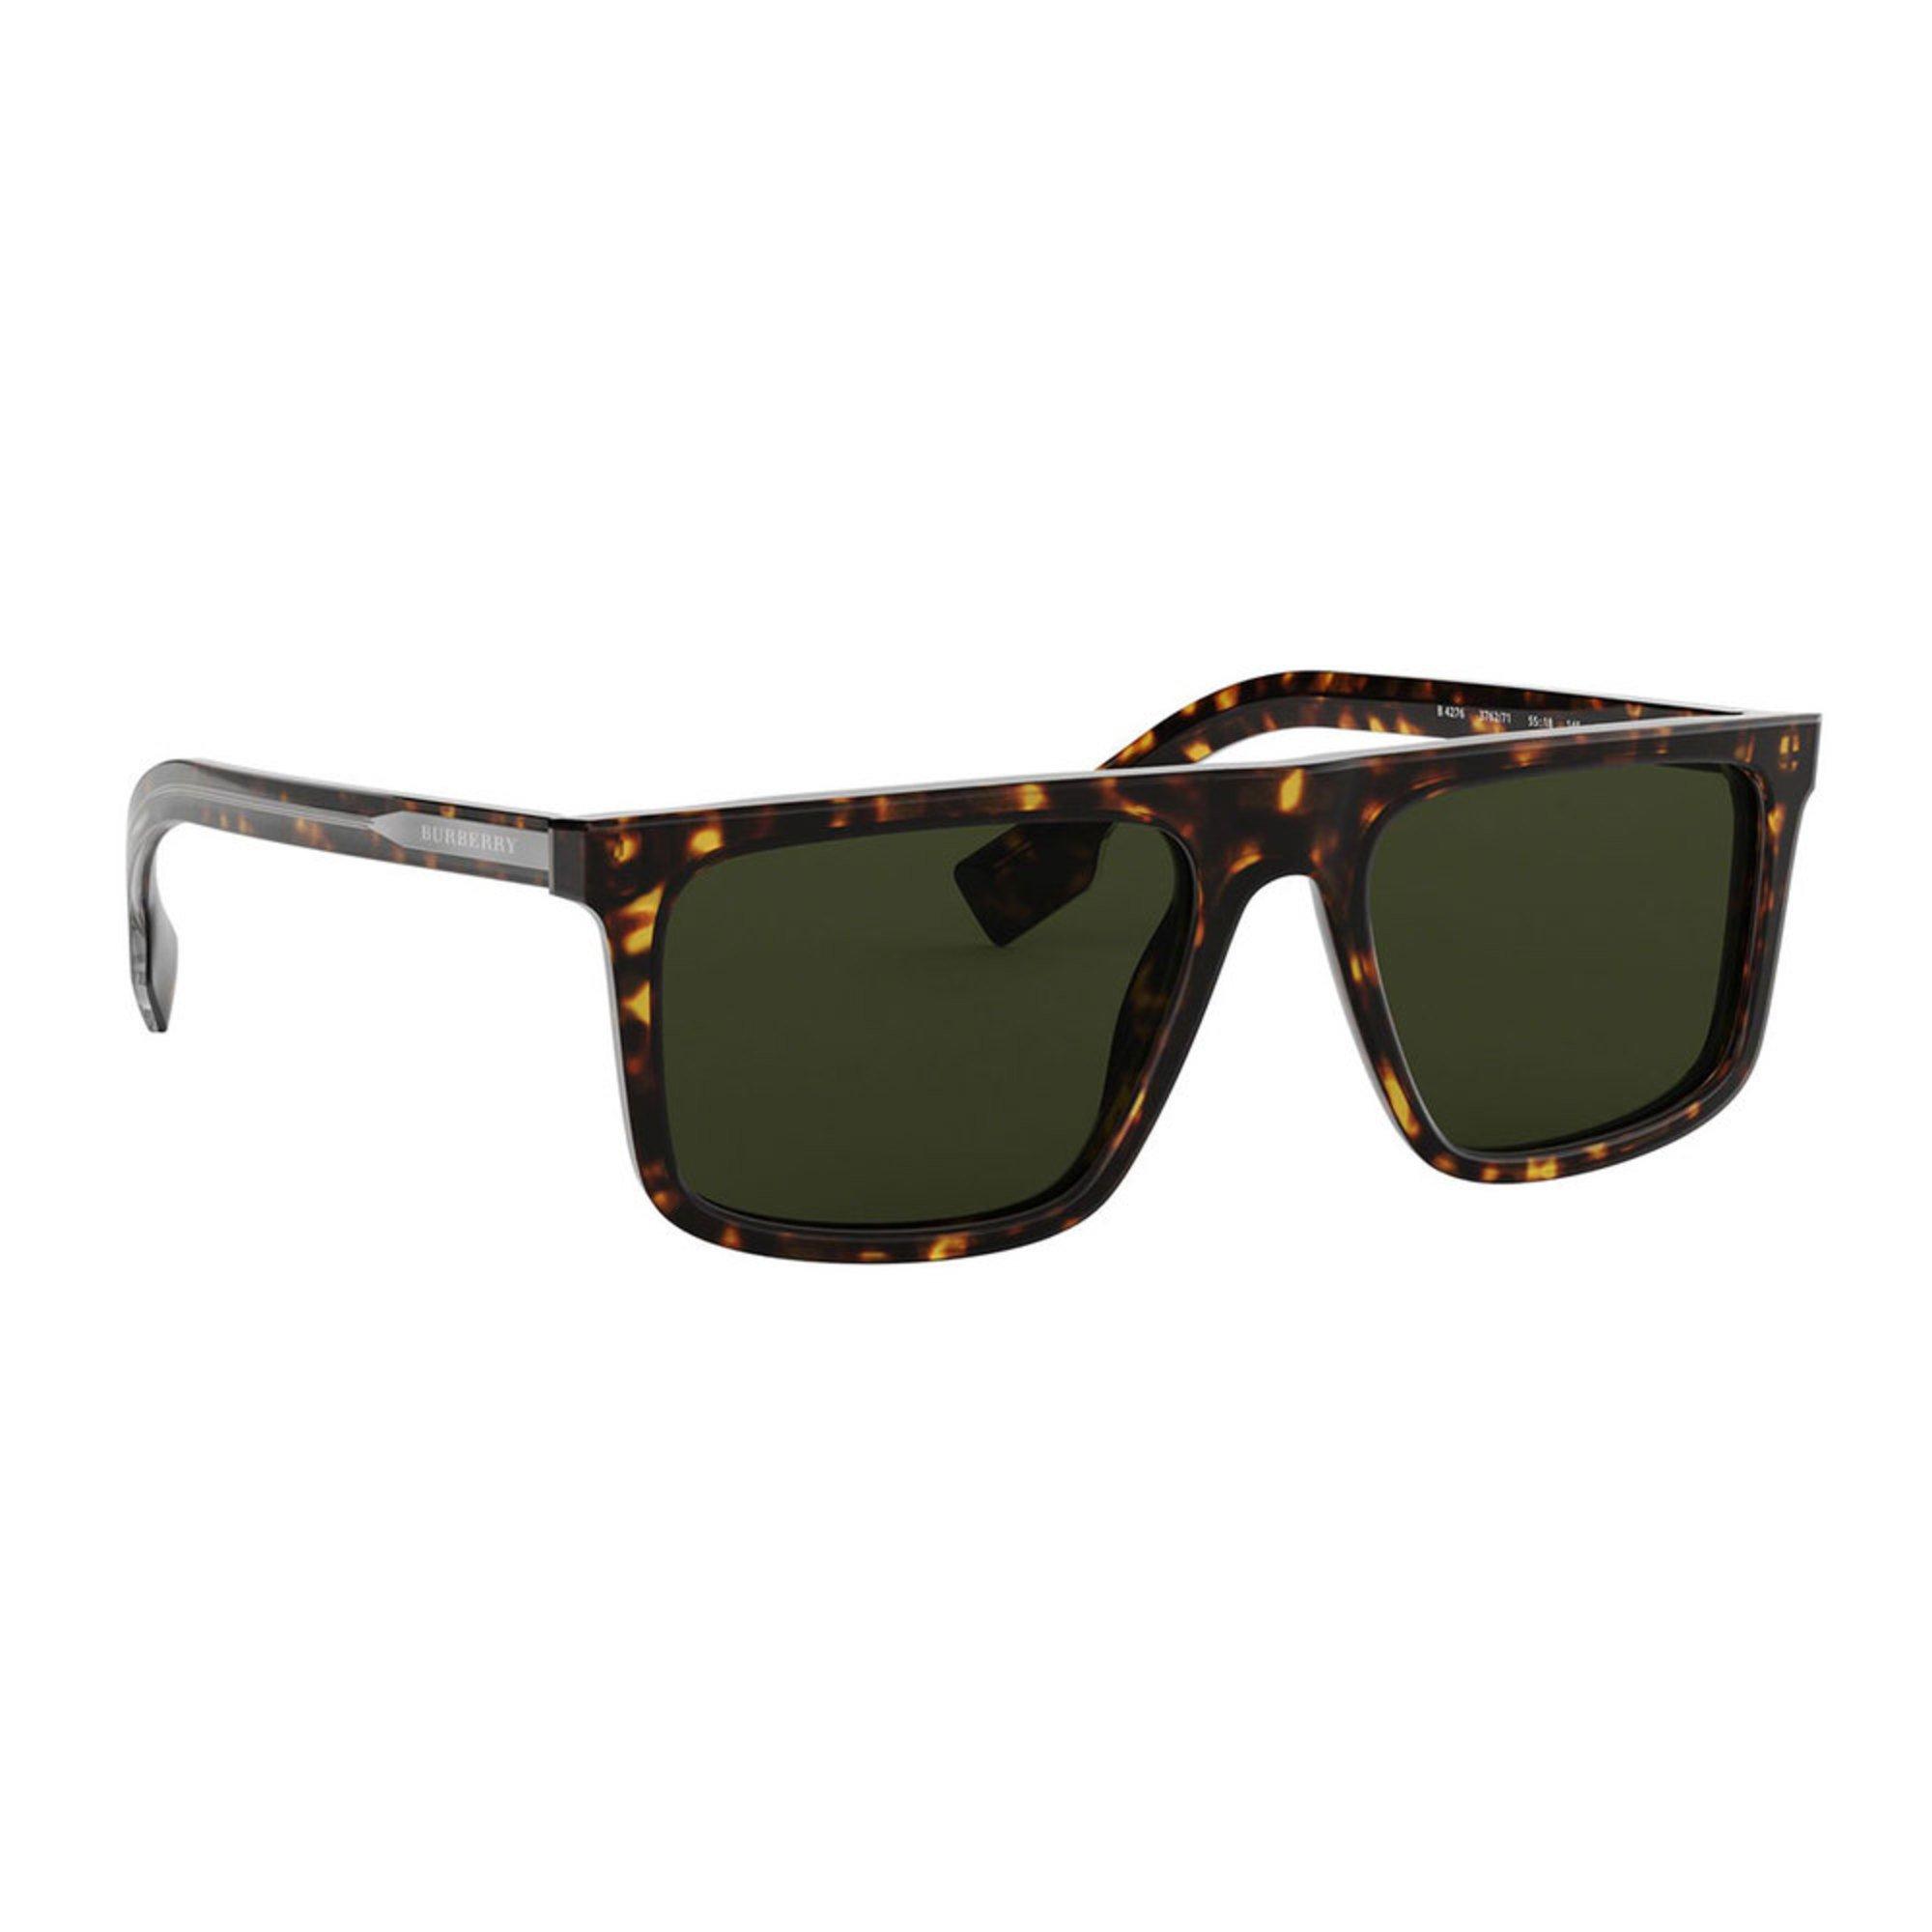 755f7f4faf9 Burberry Men's Green Dark Havana Sunglasses 55mm   Men's Sunglasses ...